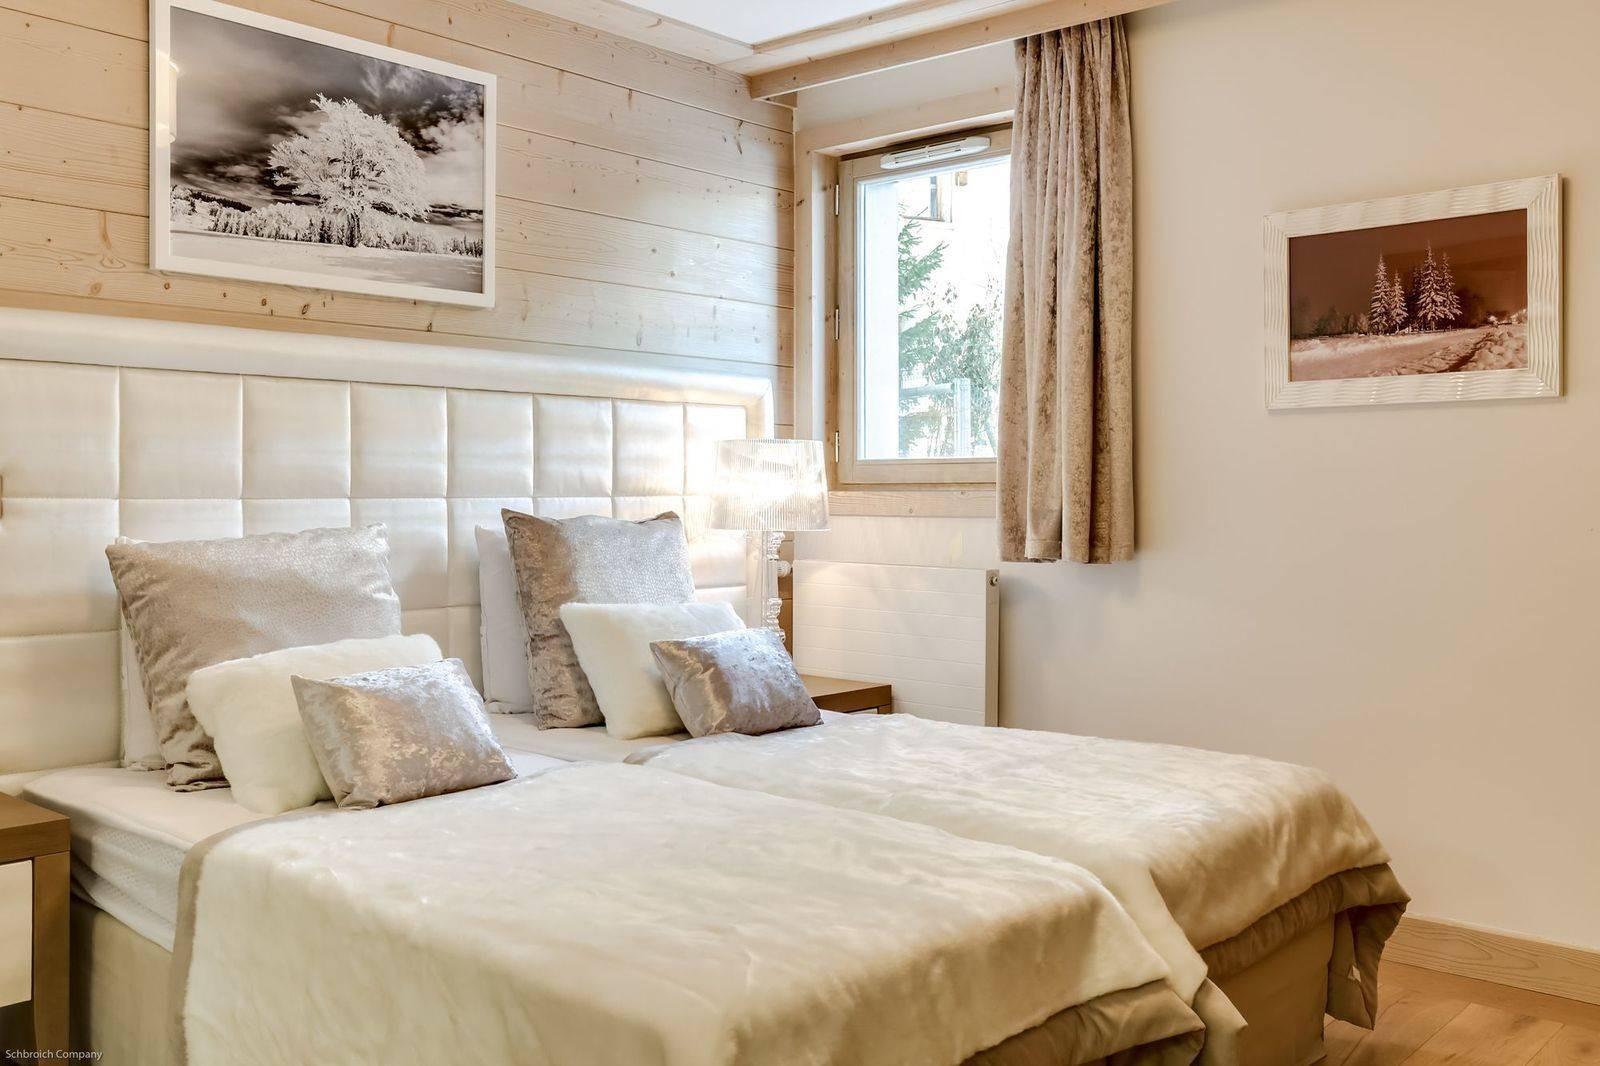 Courchevel 1550 Luxury Rental Appartment Telamite Bedroom